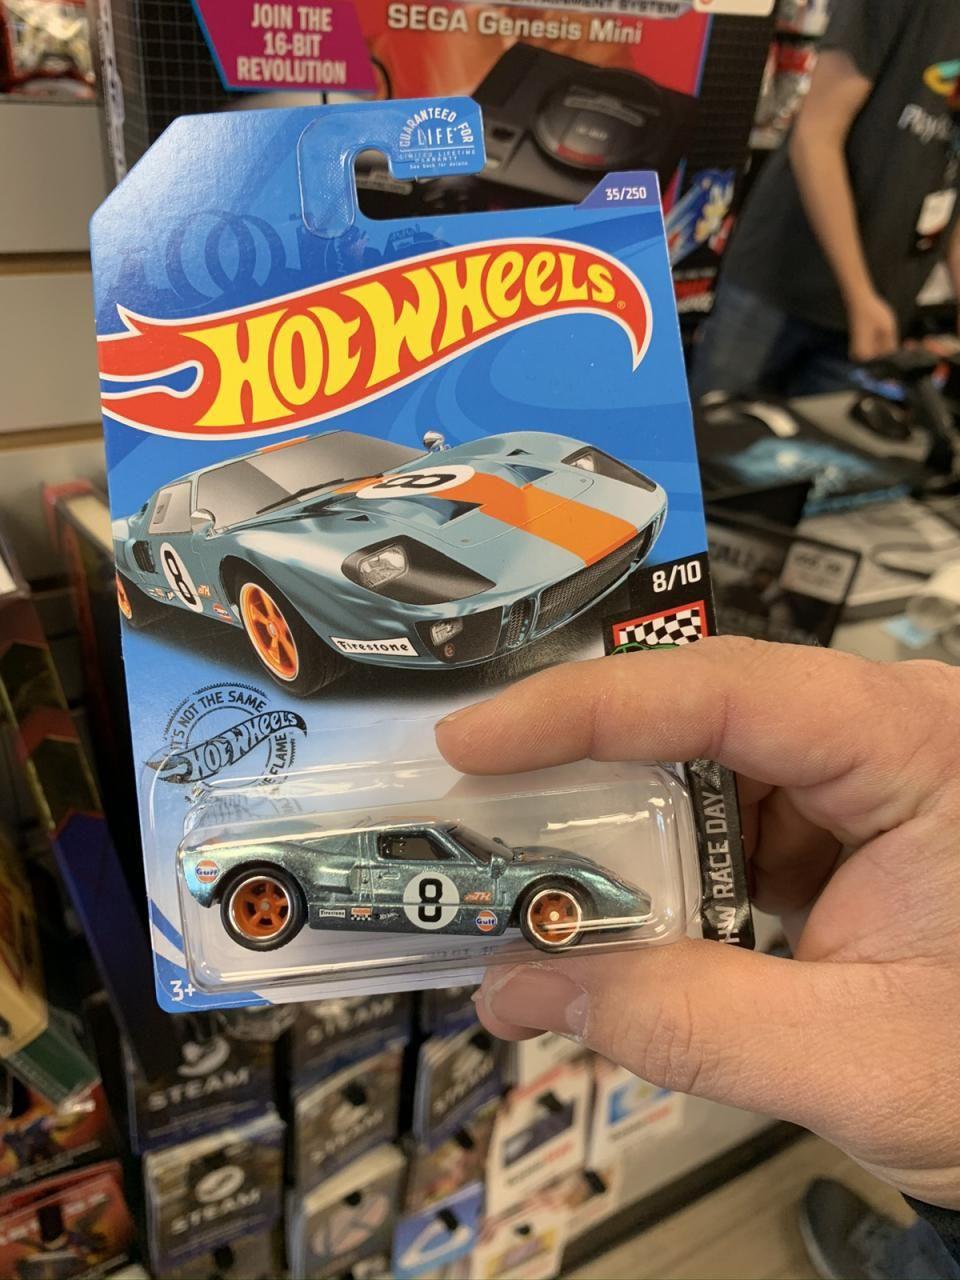 2020 Hot Wheels Rod Squad 68 Chevy Nova Gamestop Collector Day